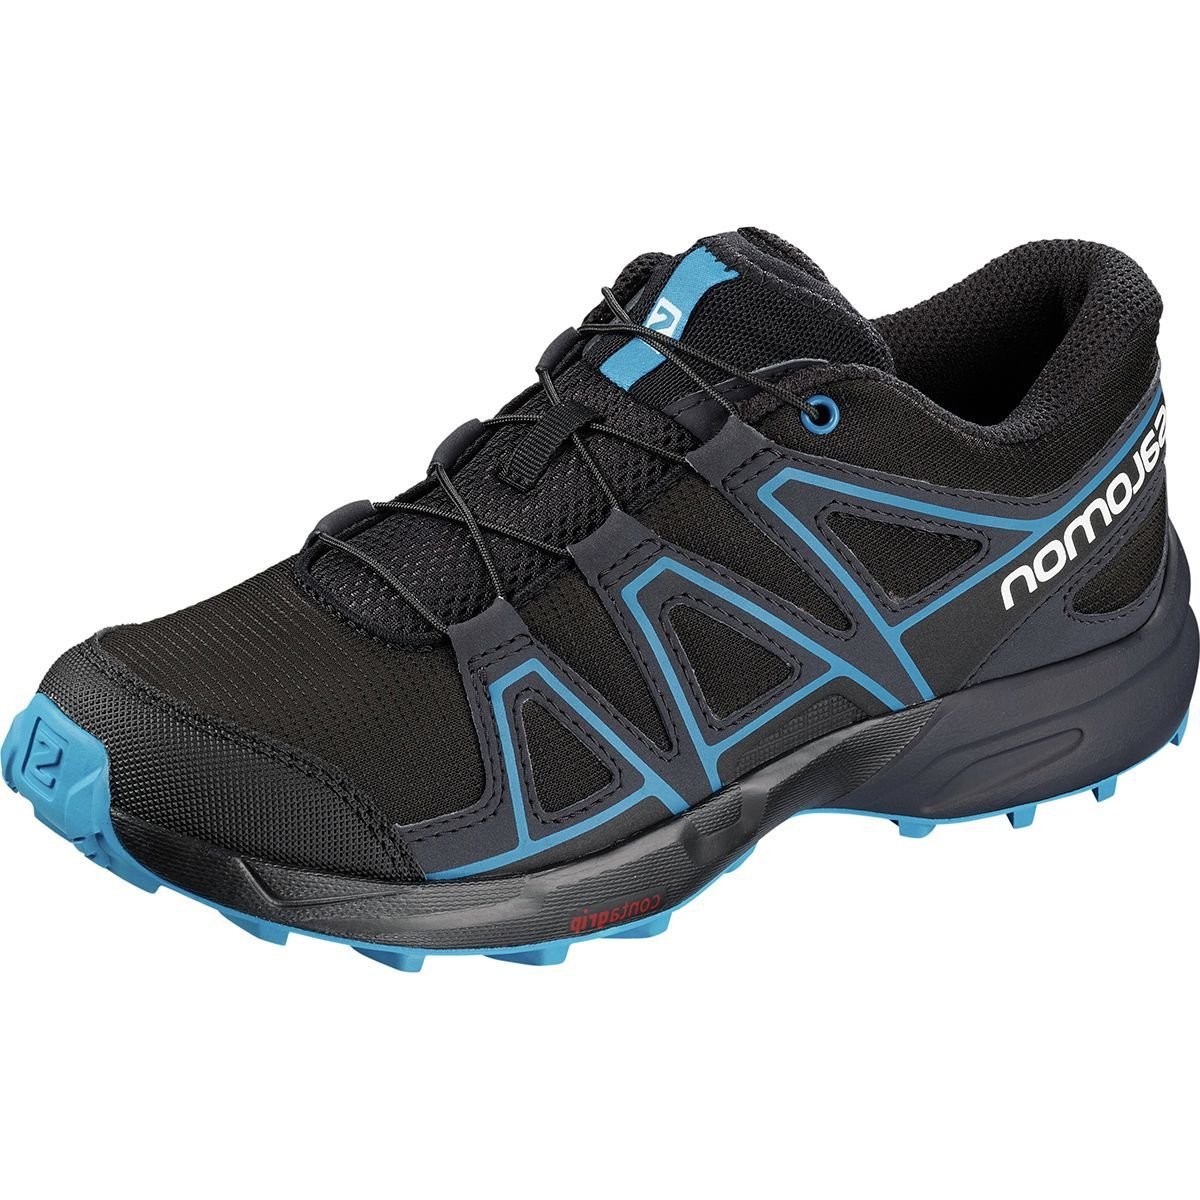 Salomon SpeedCross Jr Hiking Shoe - Boys'